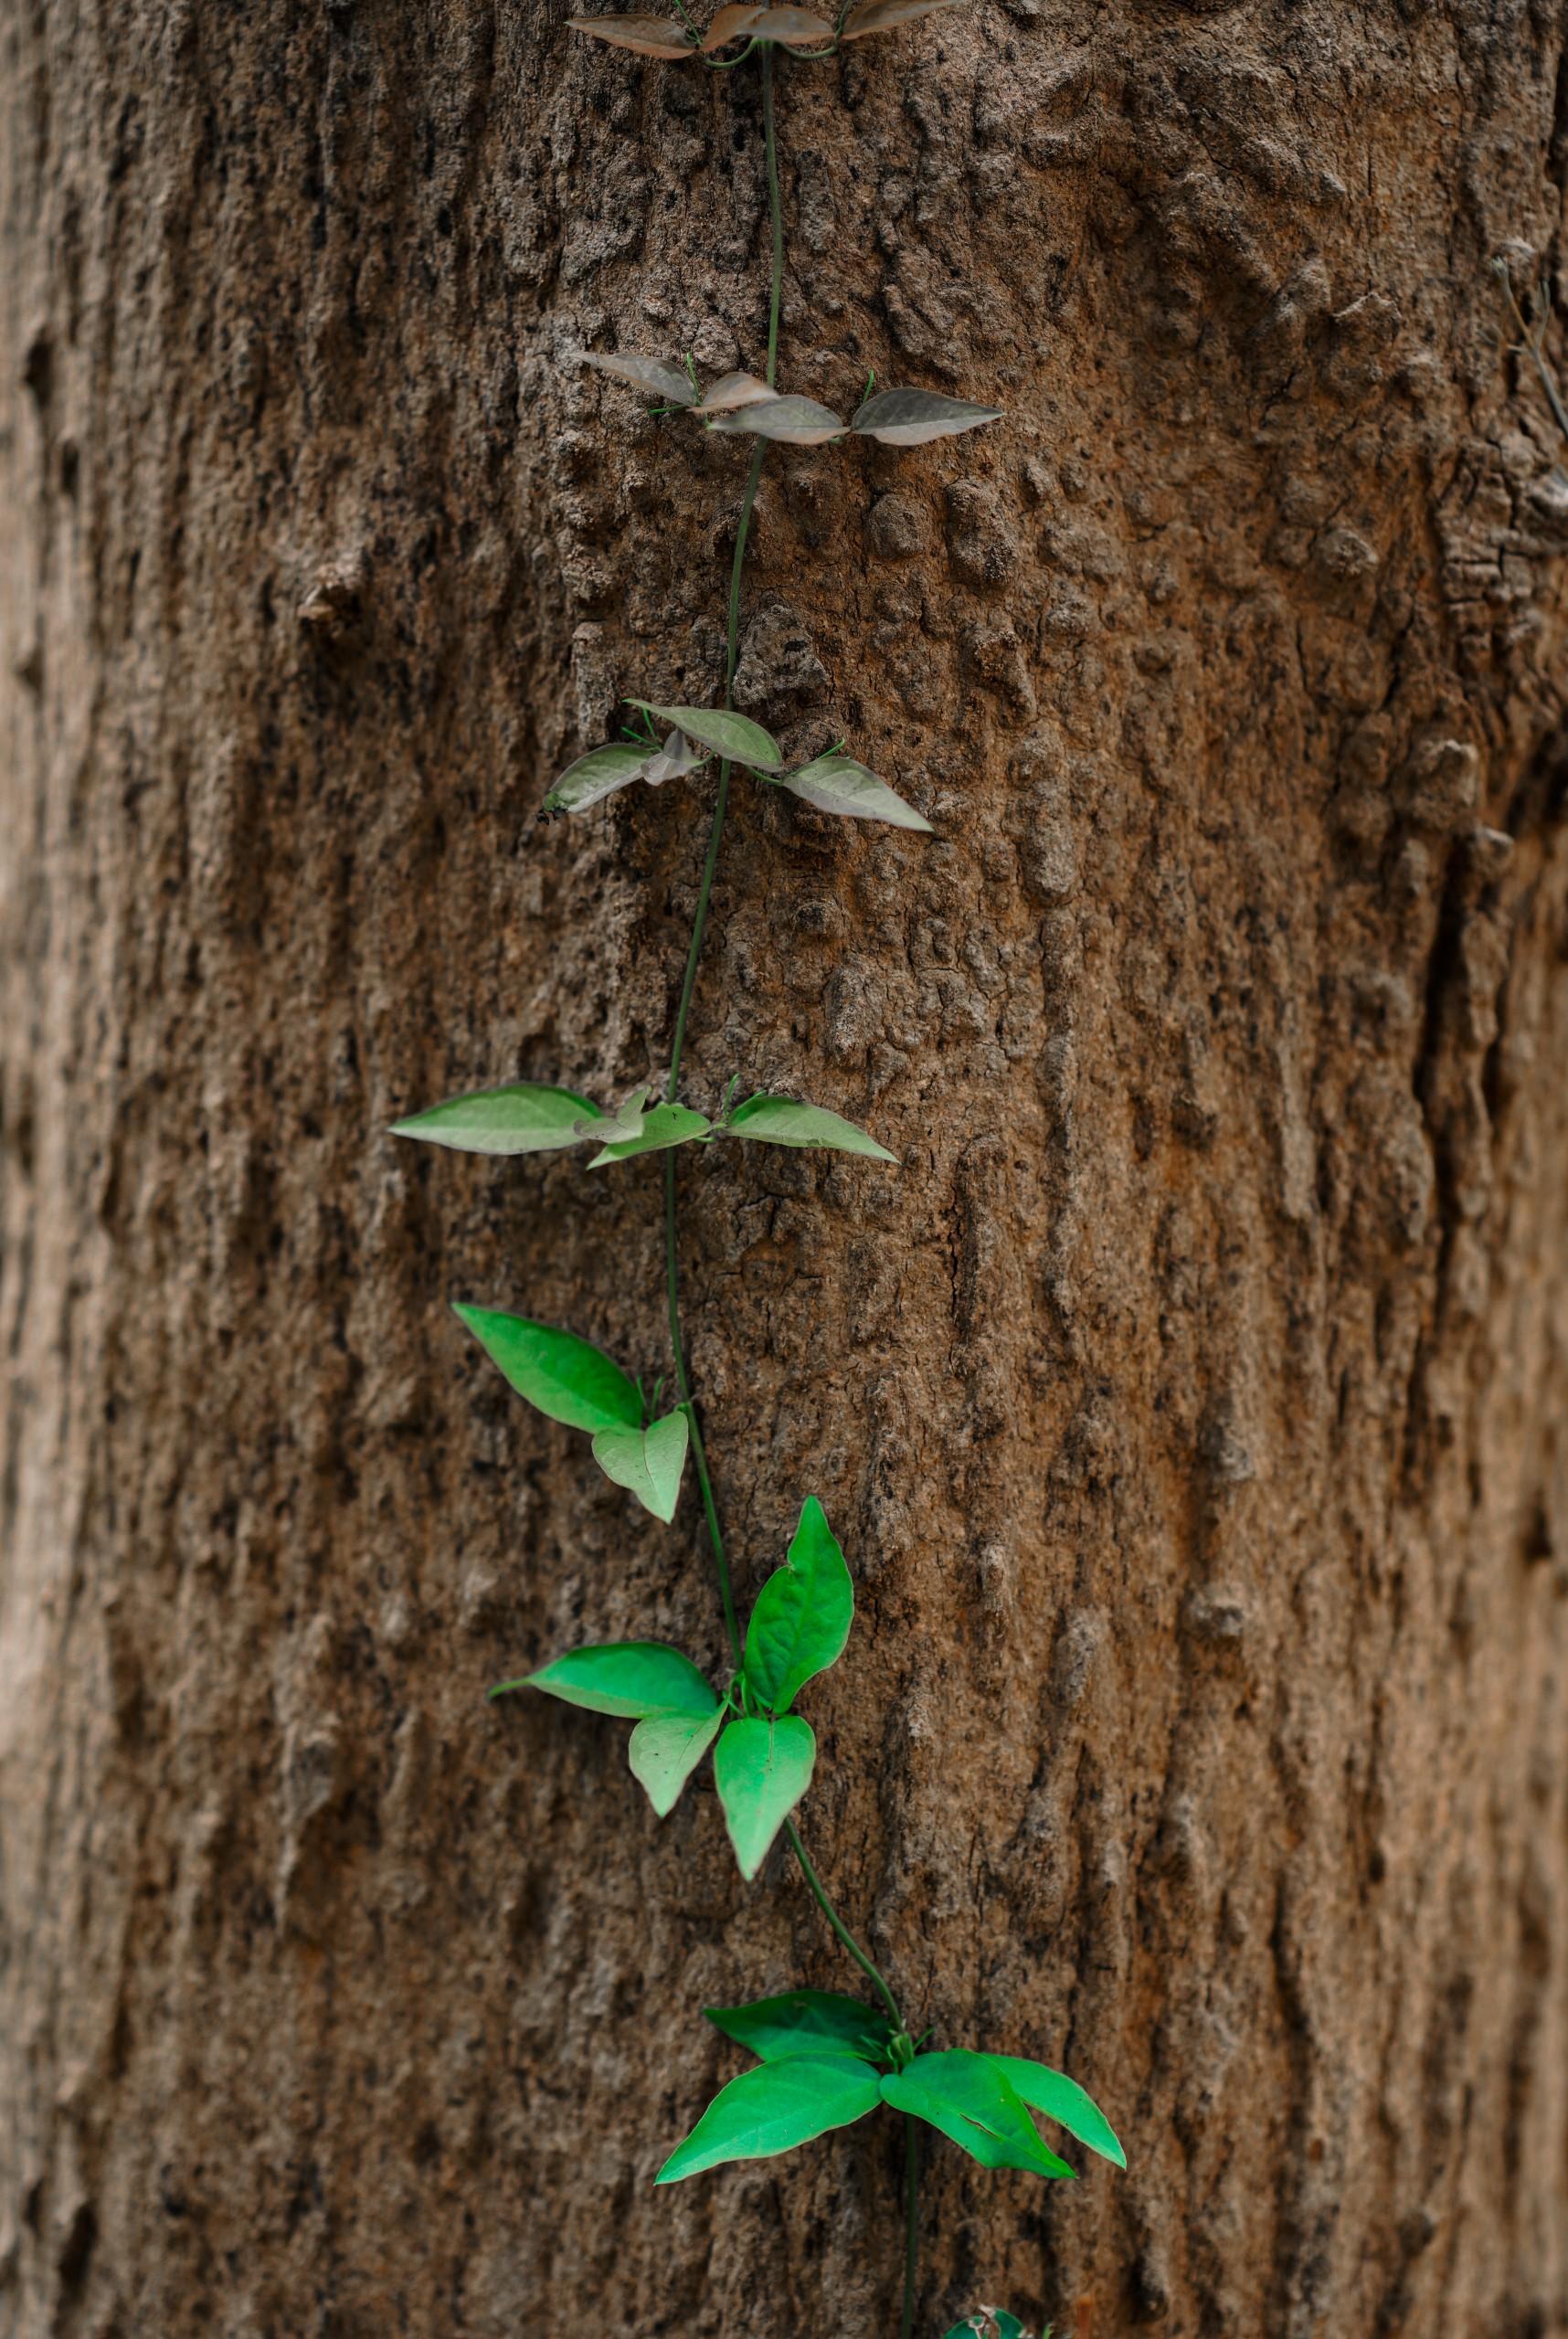 Climbing plant on a tree